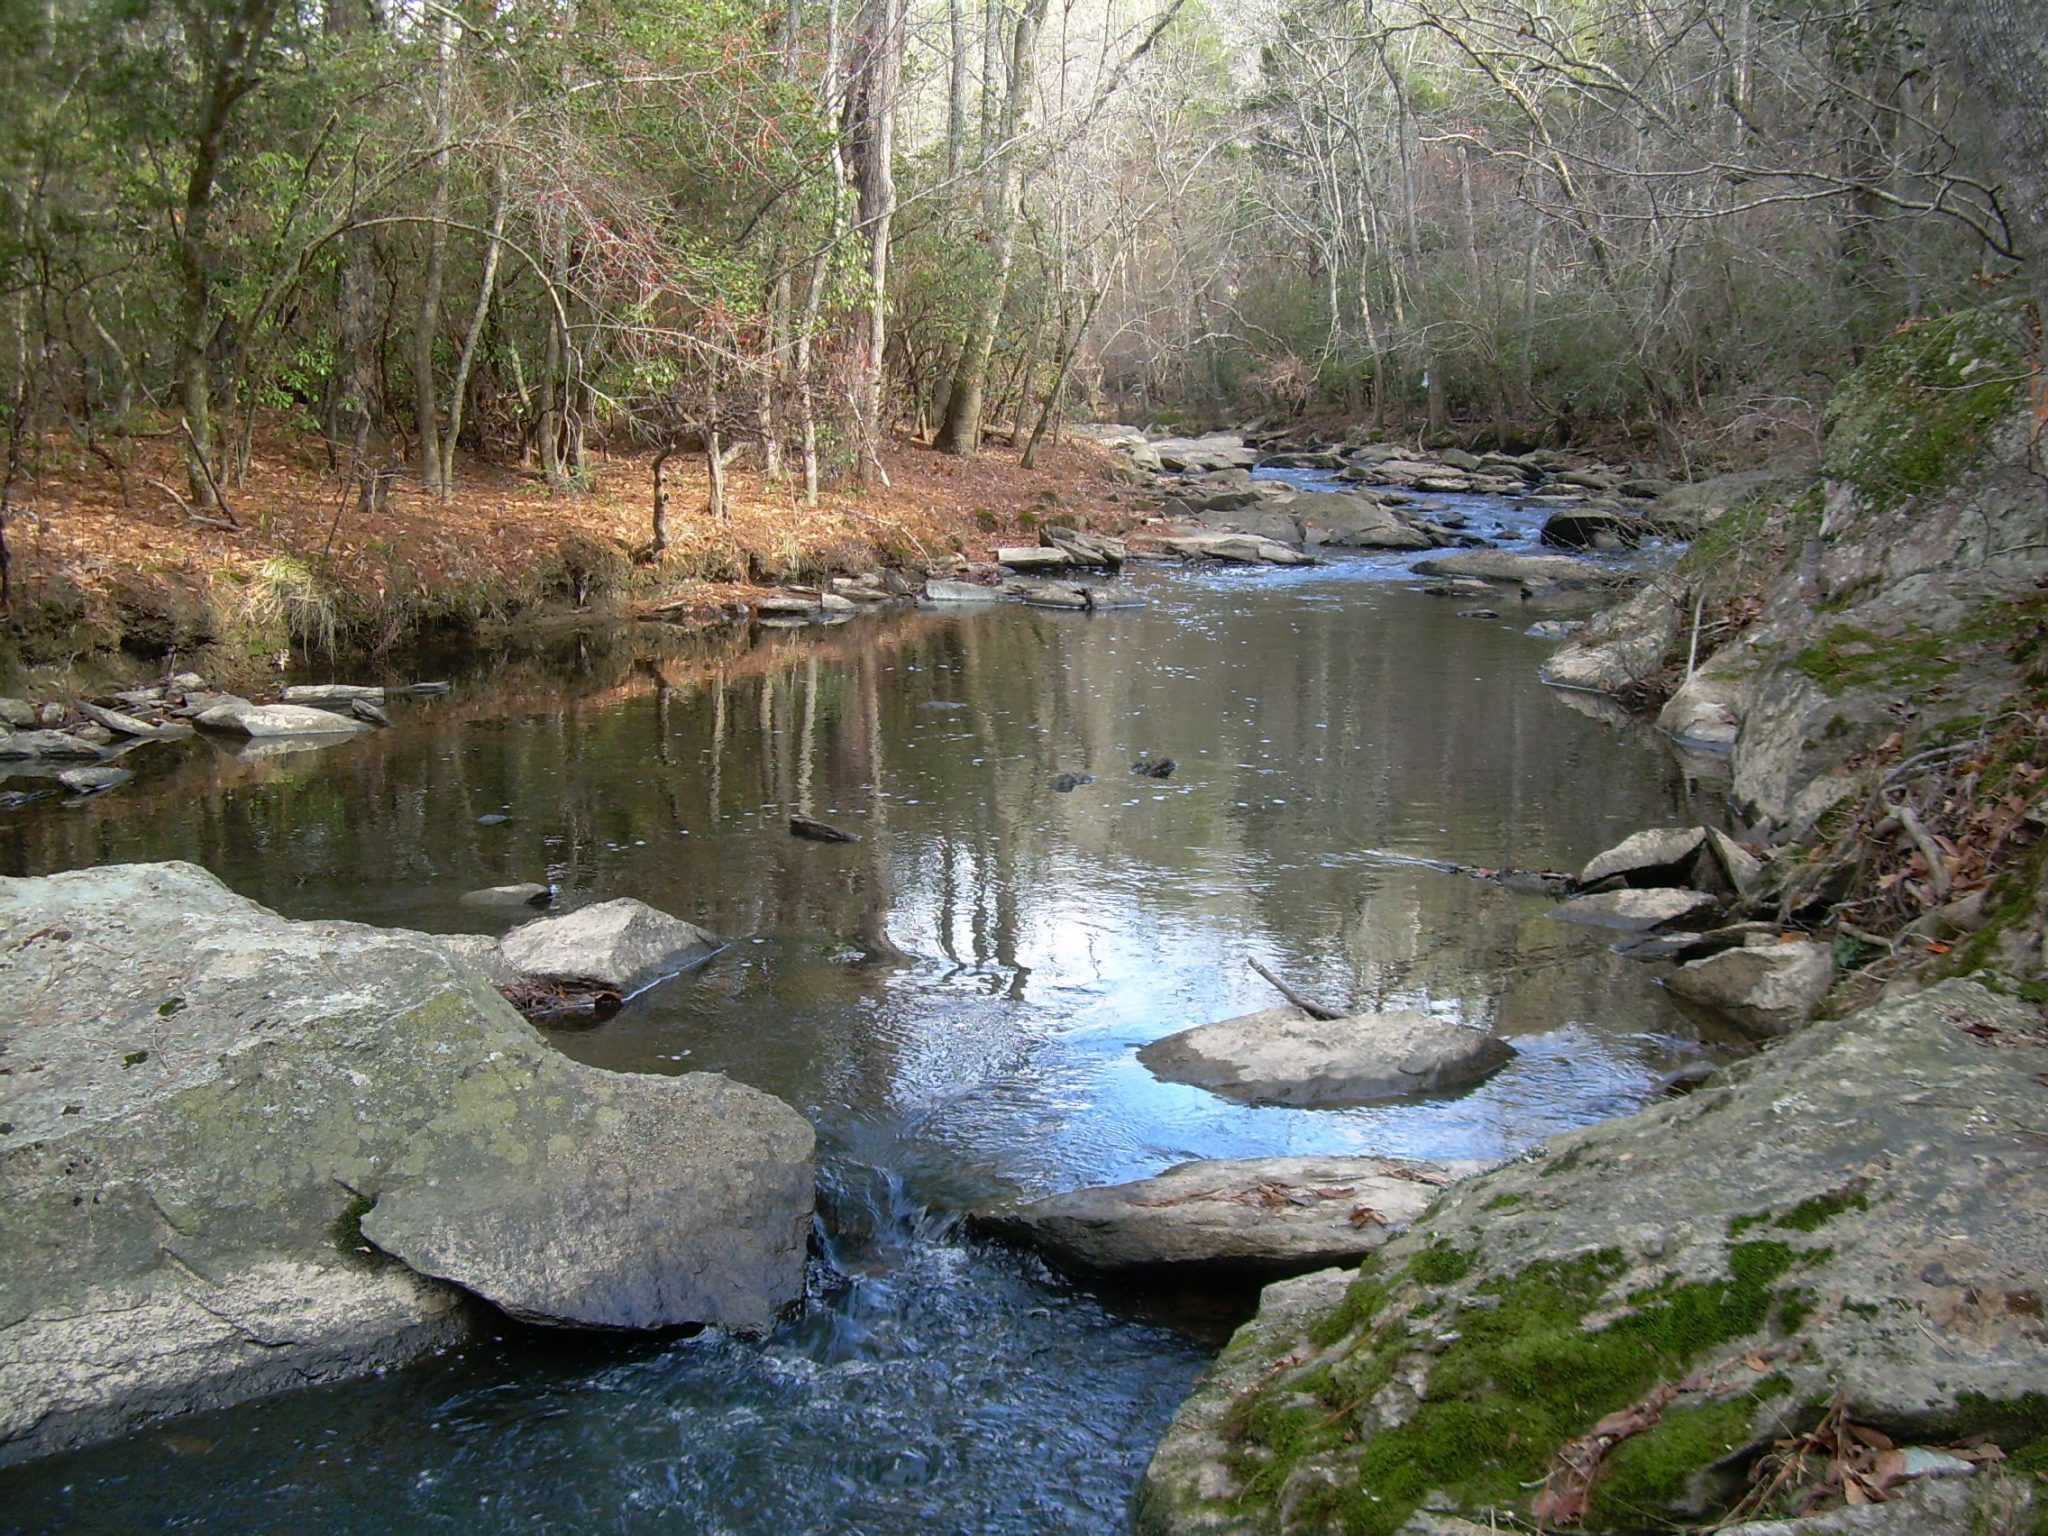 Denson's Creek